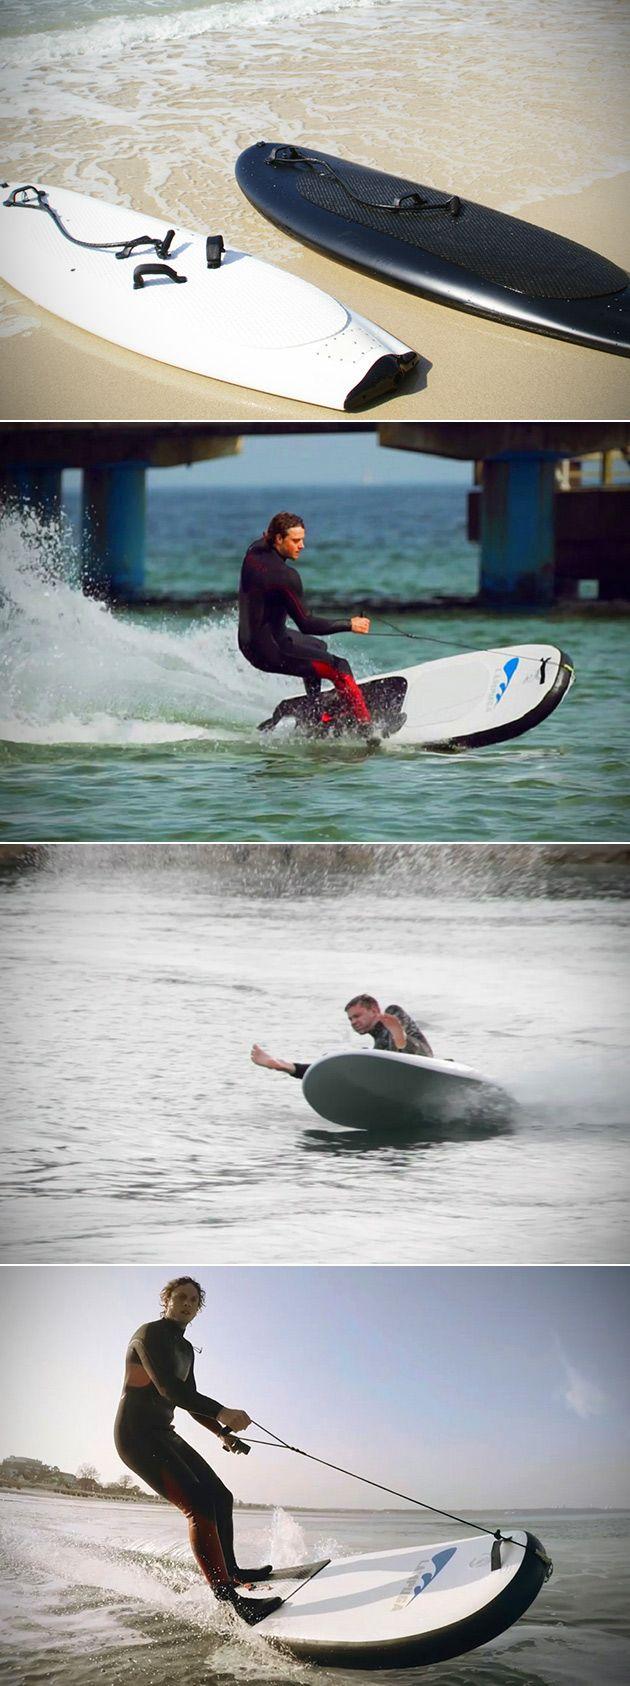 Pin By Jack On Jet Powered Surfboard On Sales Pinterest  # Muebles Quivir Pibo